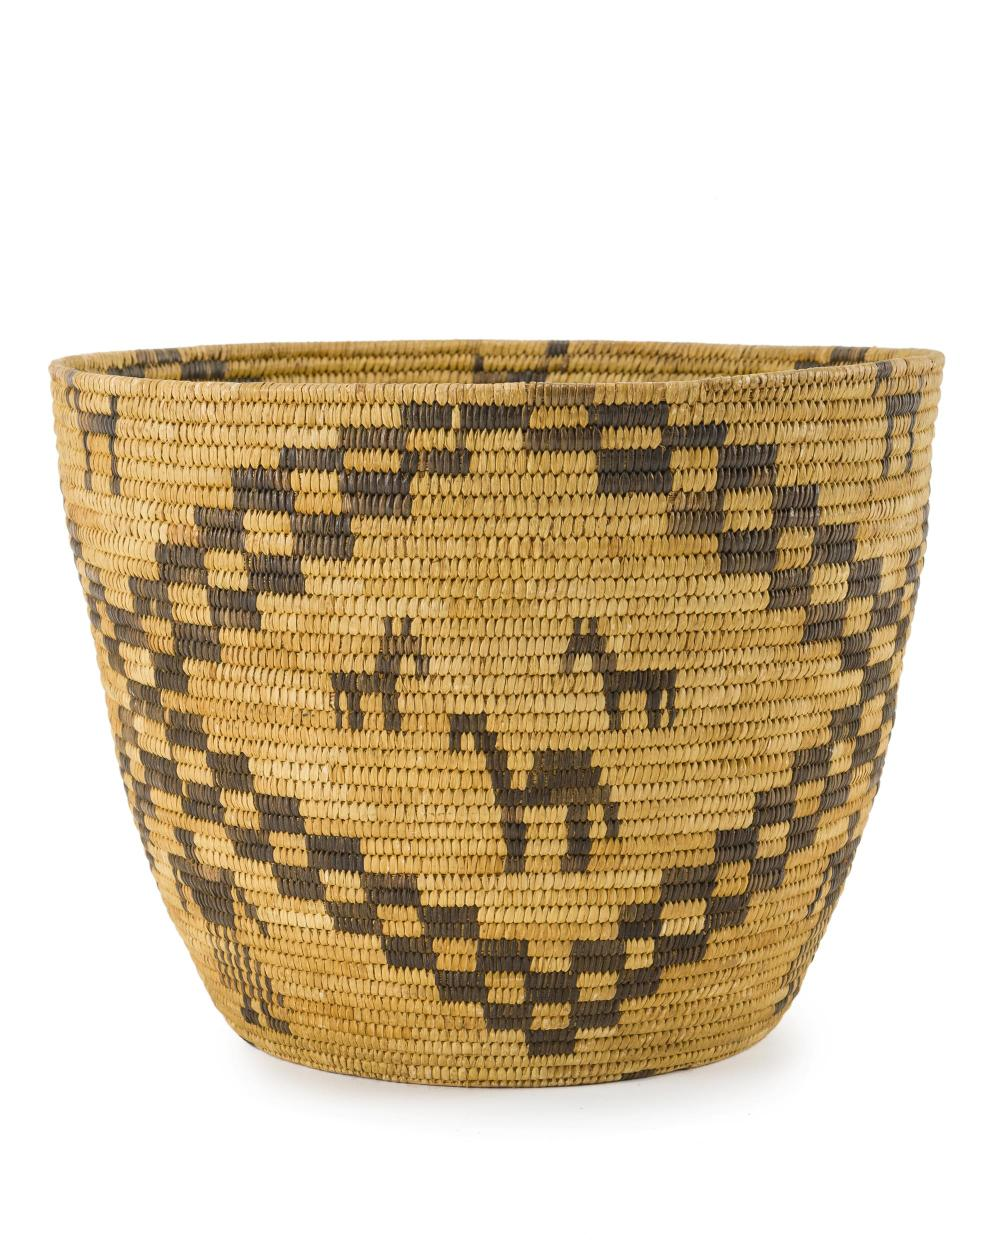 A Papago figural basket